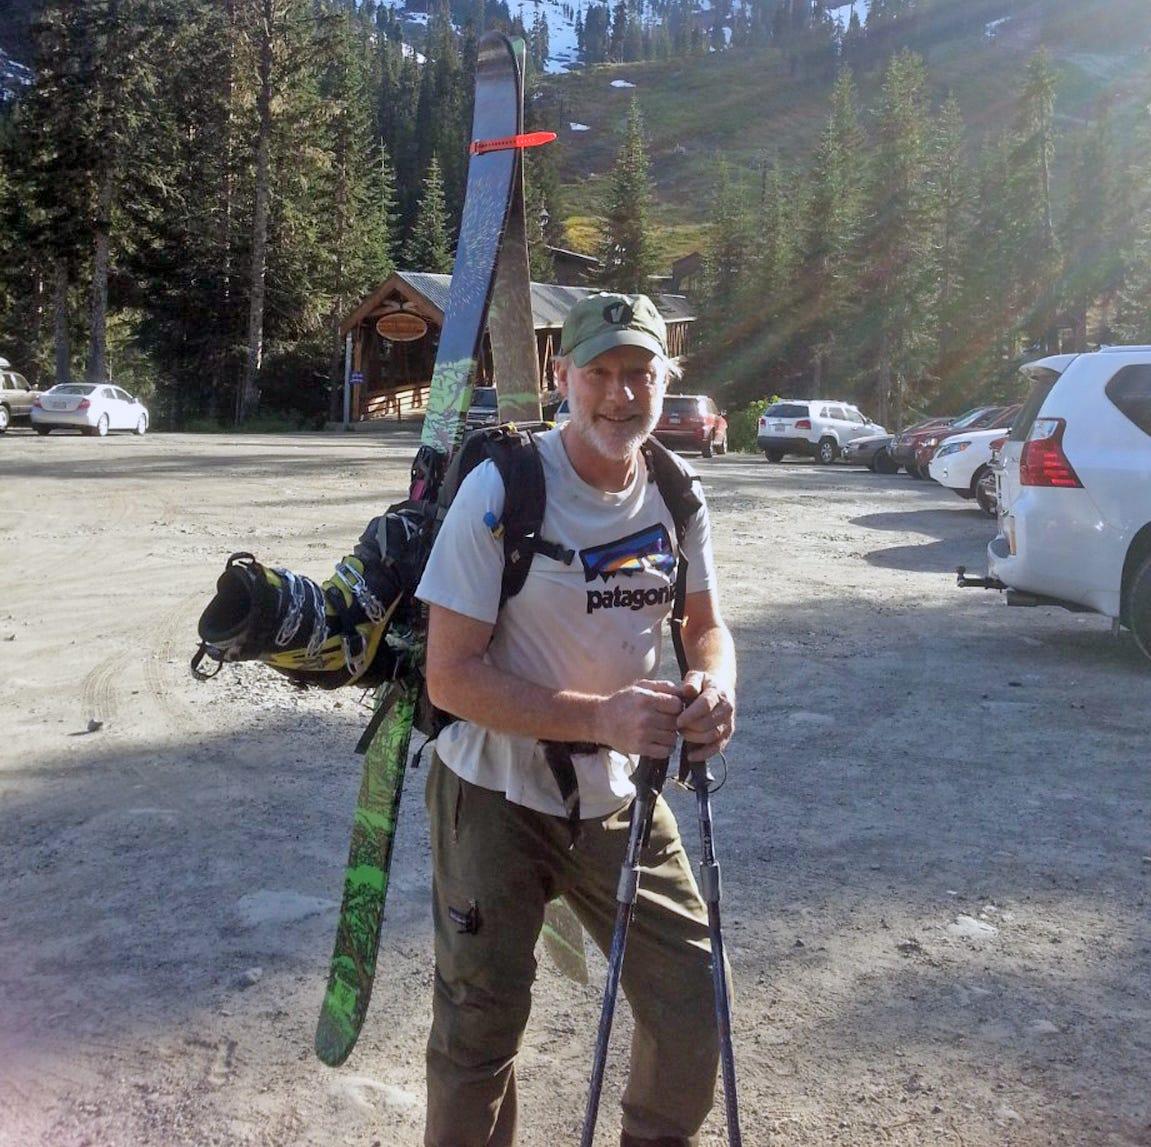 Terry Mosher: Mack Johnson still has mountains to climb ... and ski down